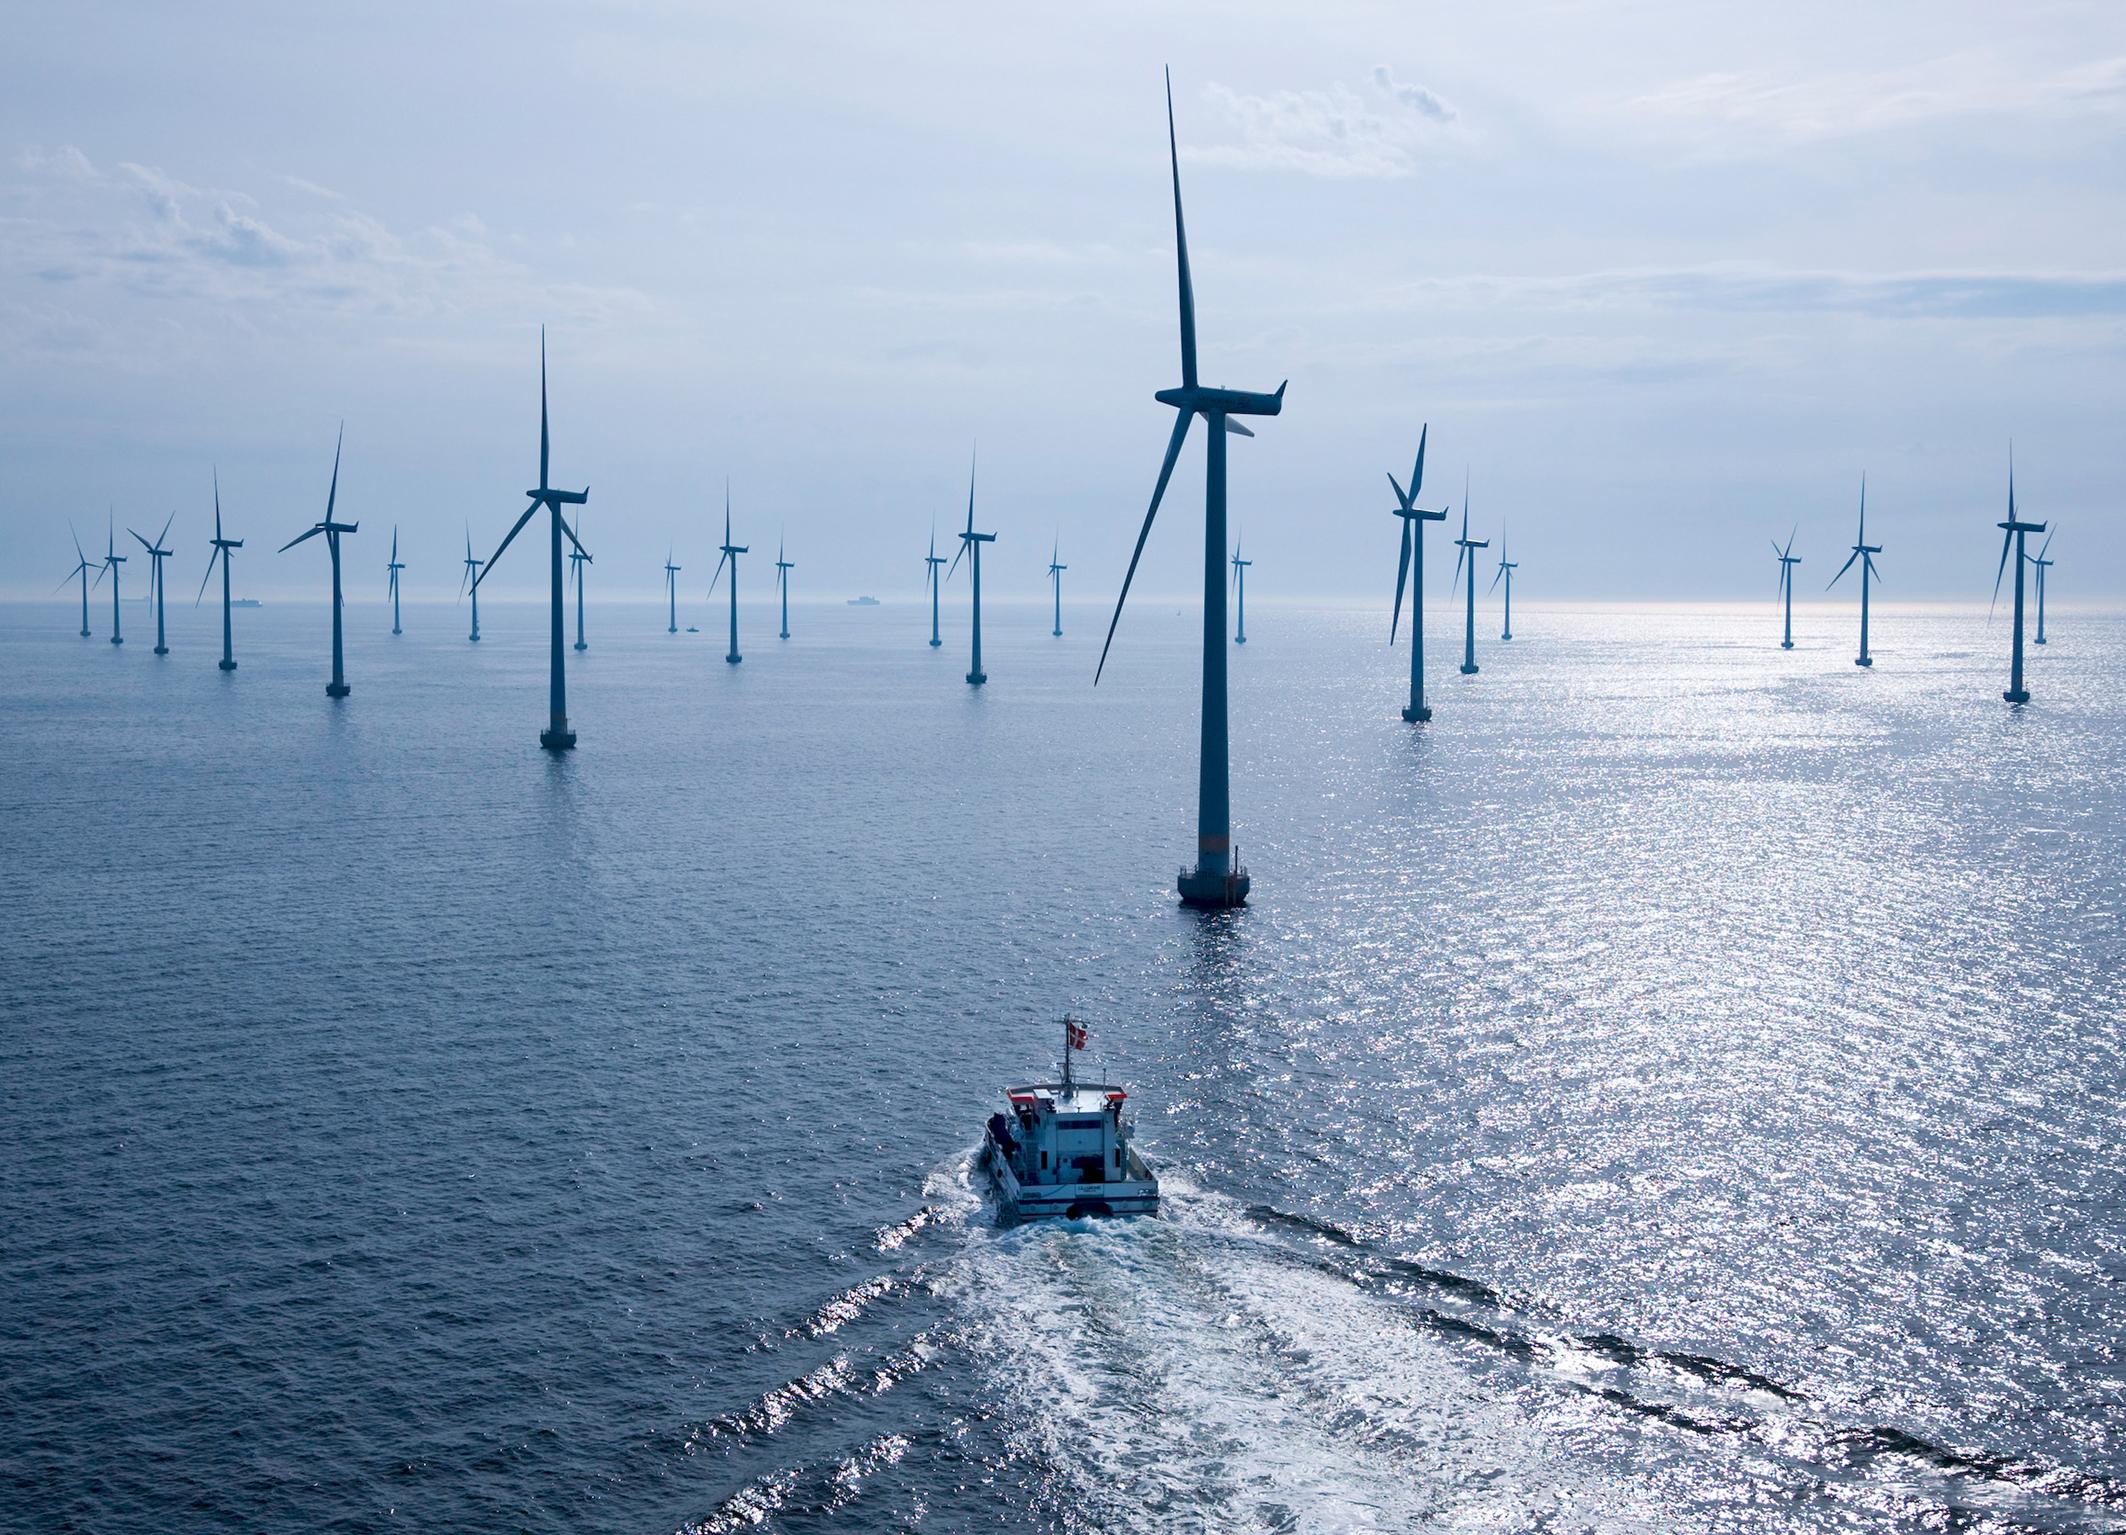 http://www.evwind.es/wp-content/uploads/2012/07/offshoregrande.jpg